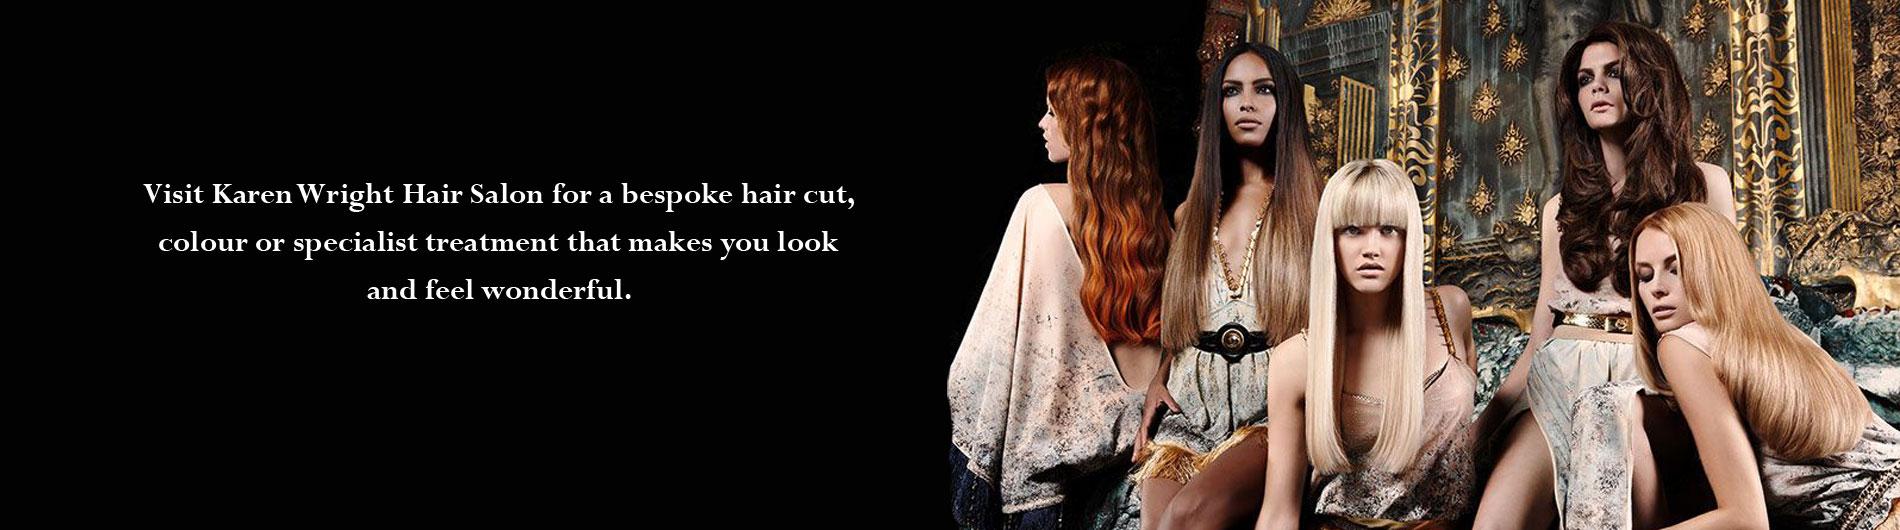 Karen Wright Hair Salon